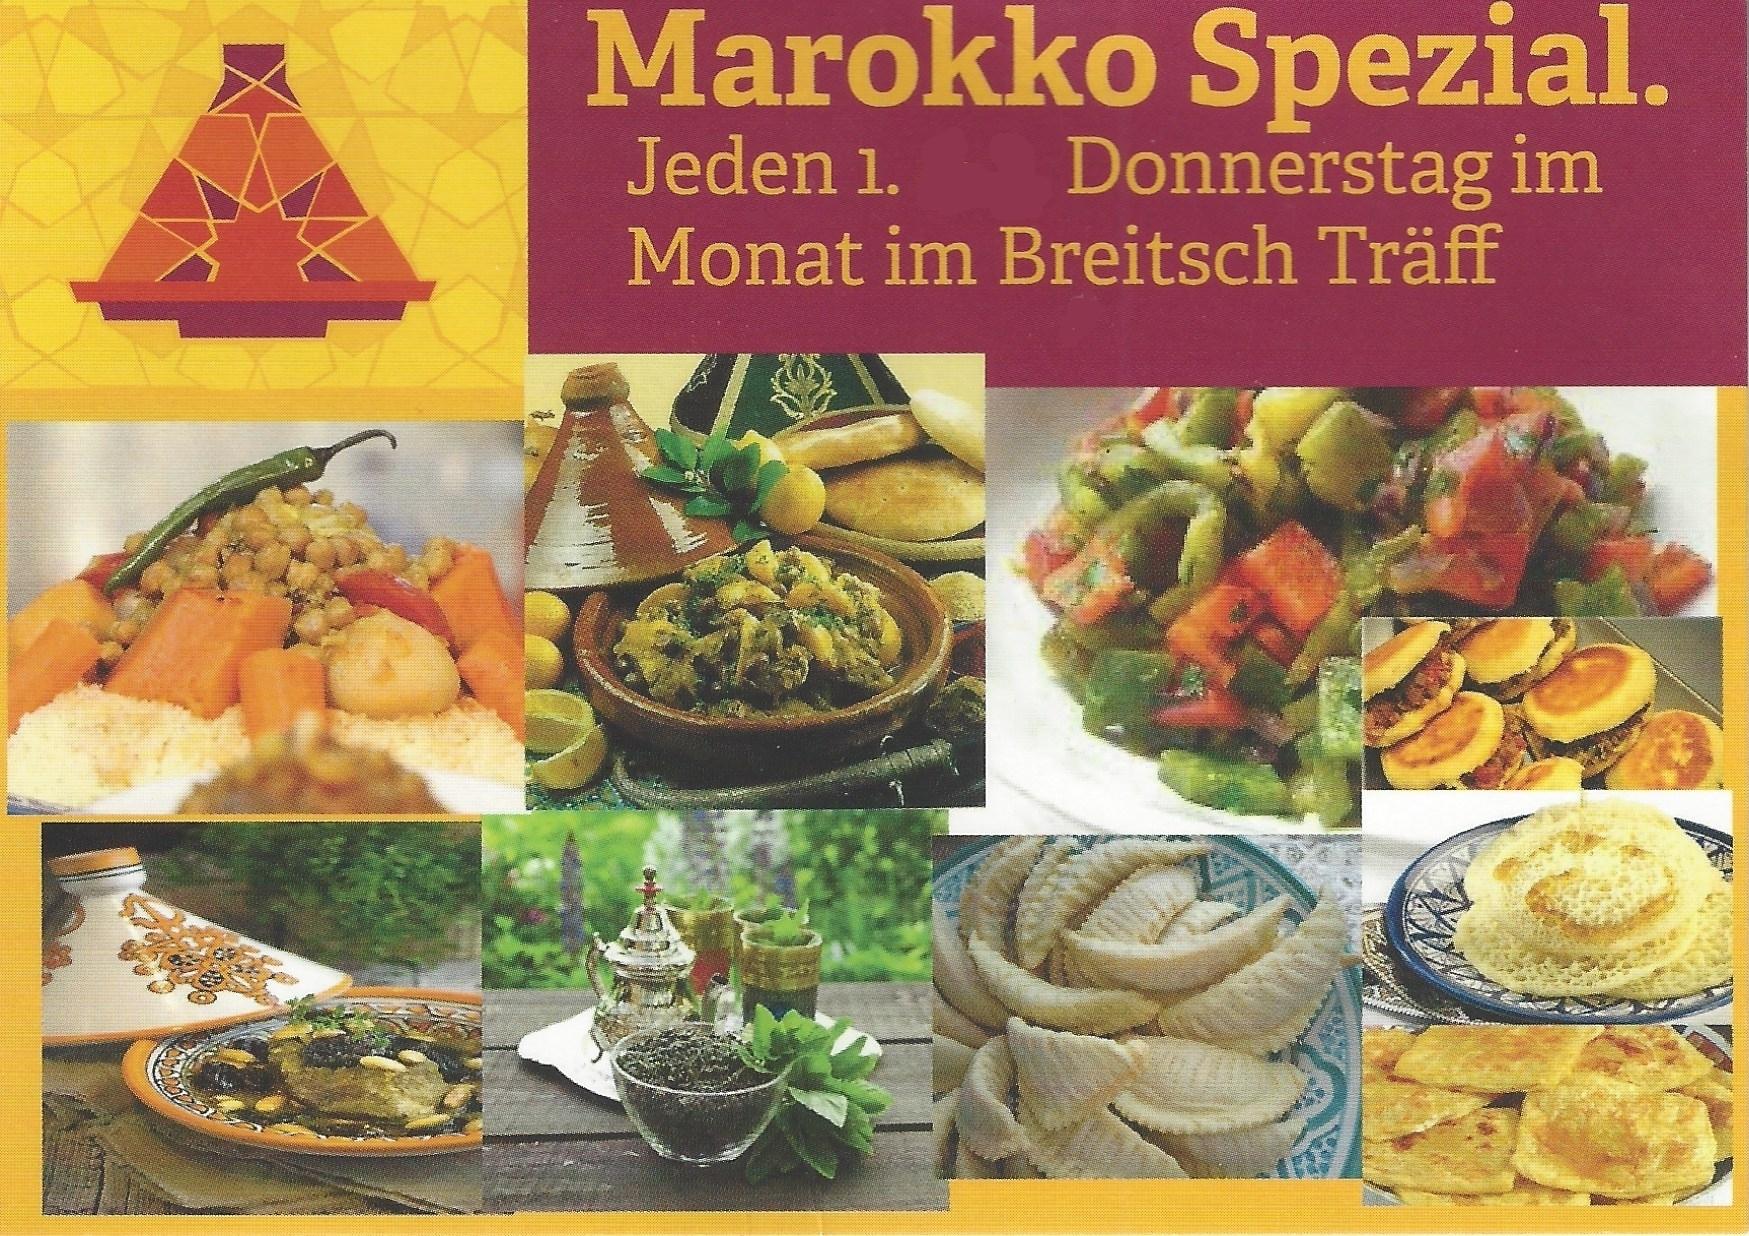 Marokko Spezial.